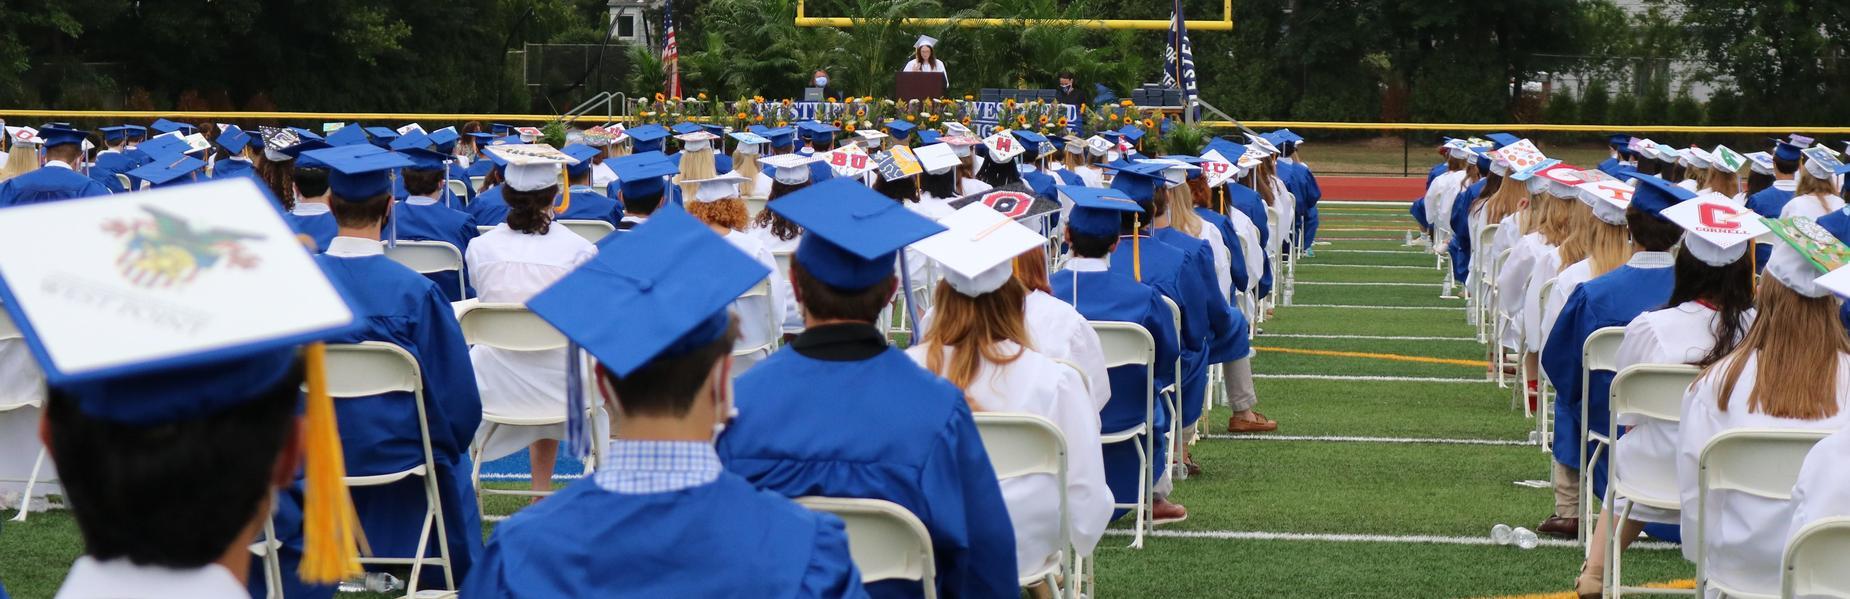 Photo of Class of 2020 graduation